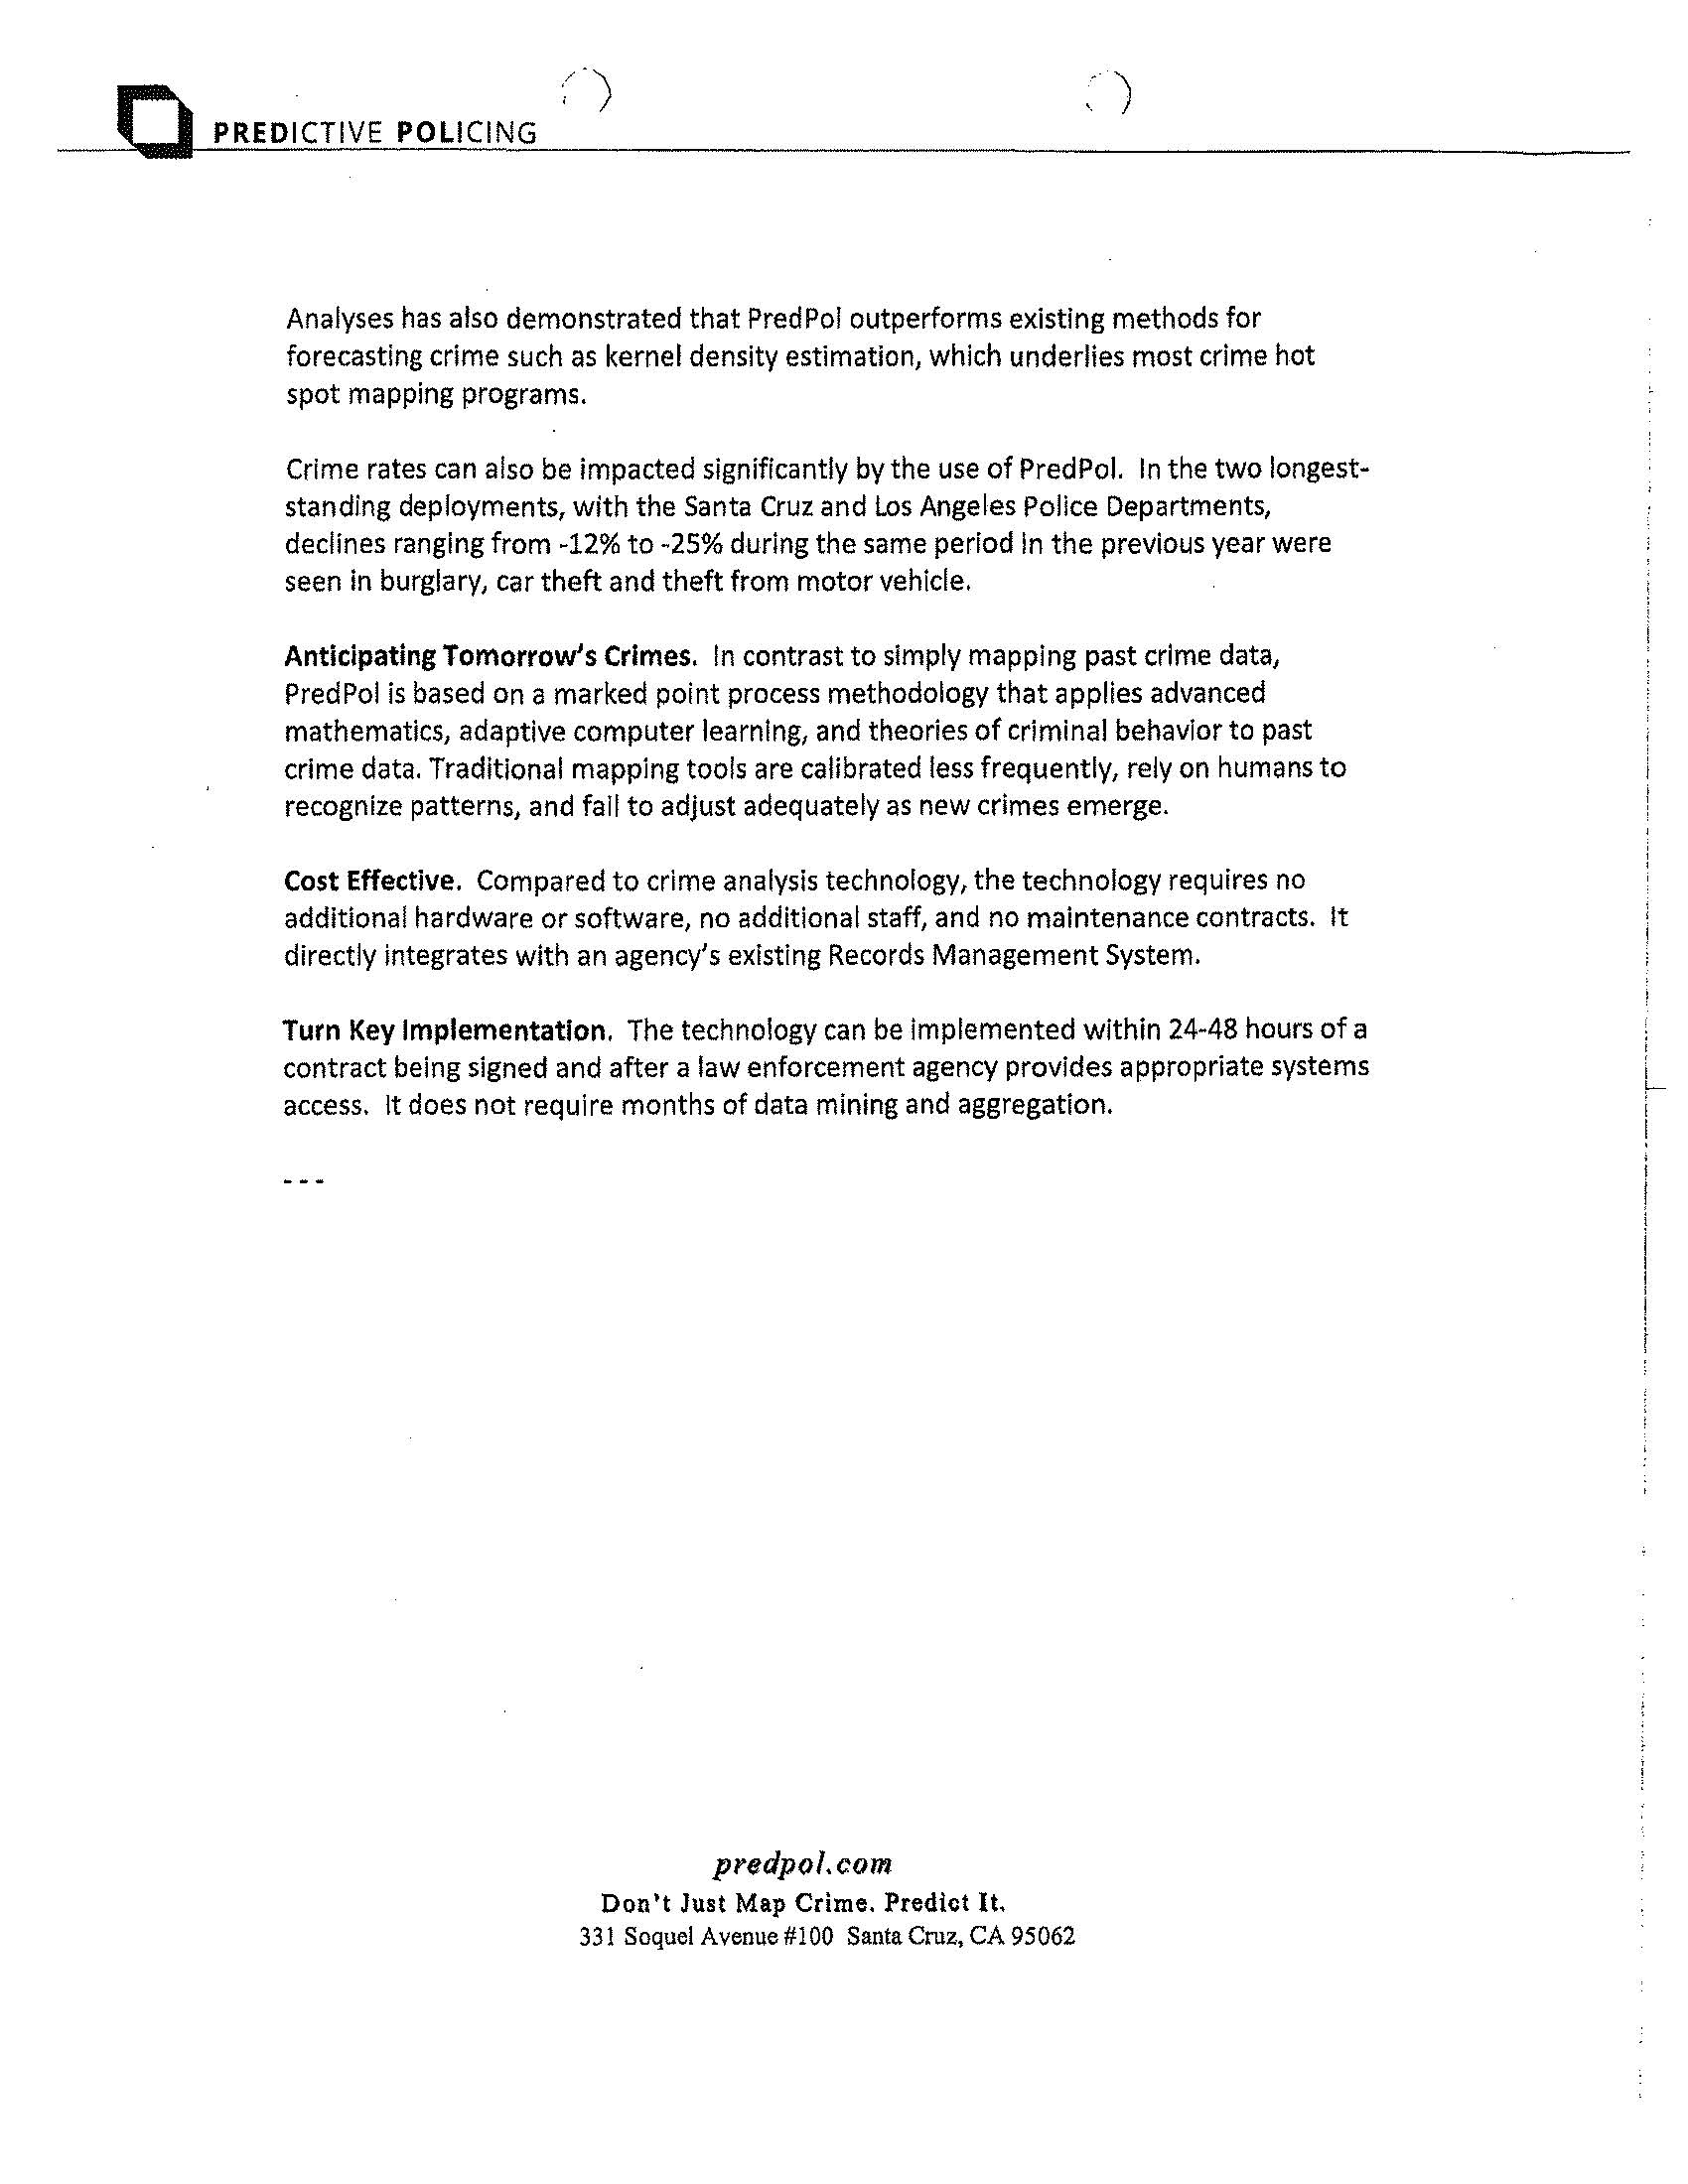 Modesto Police Department Correspondence with Predictive